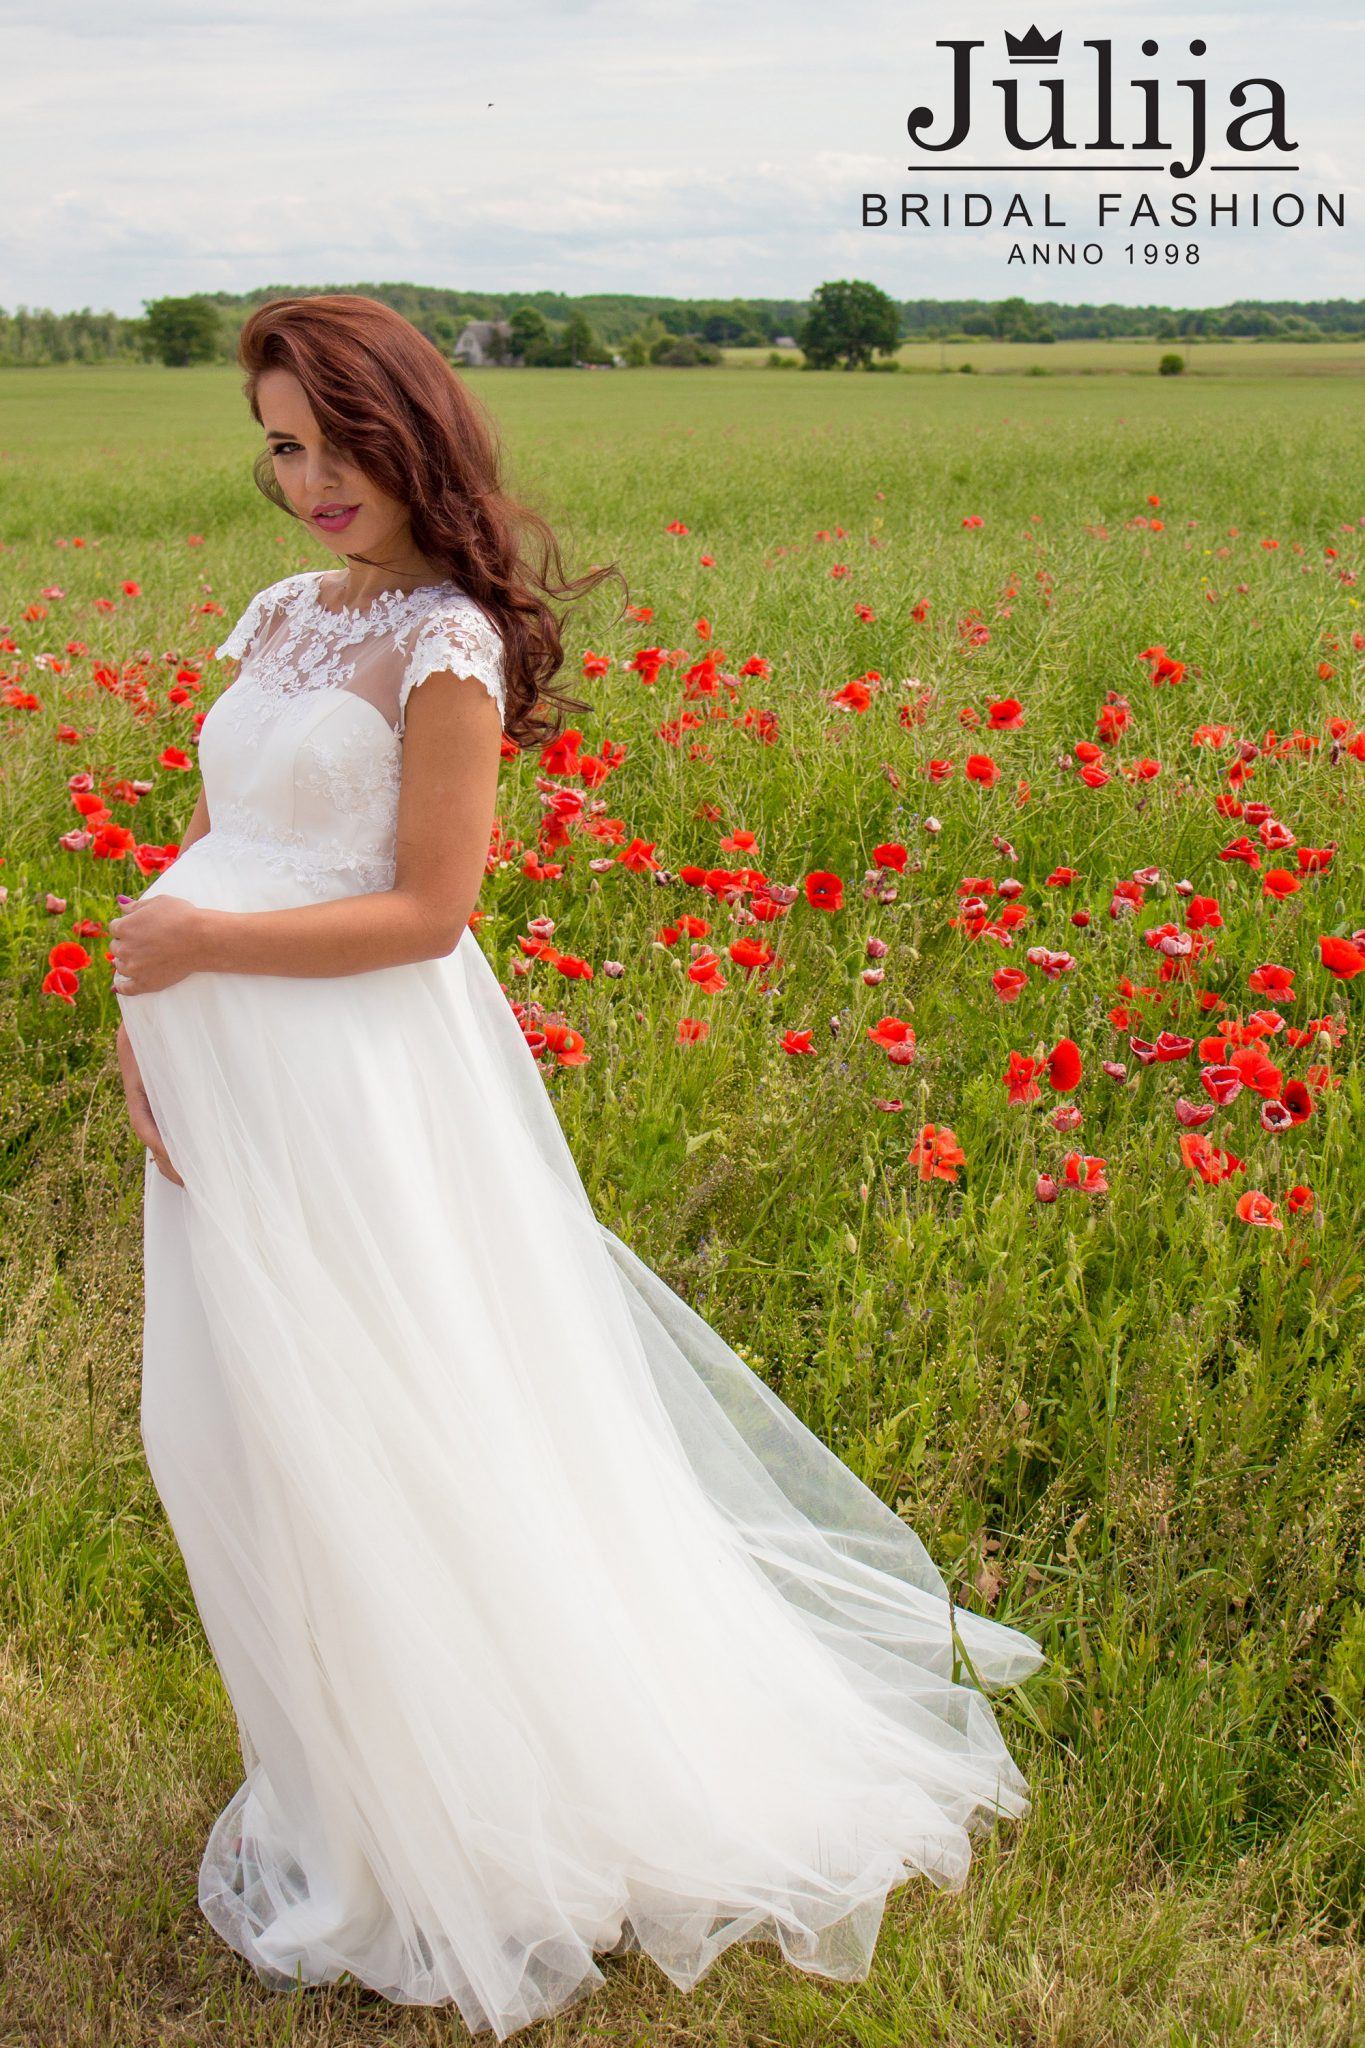 Peoria   Wholesale wedding dresses - Julija Bridal Fashion